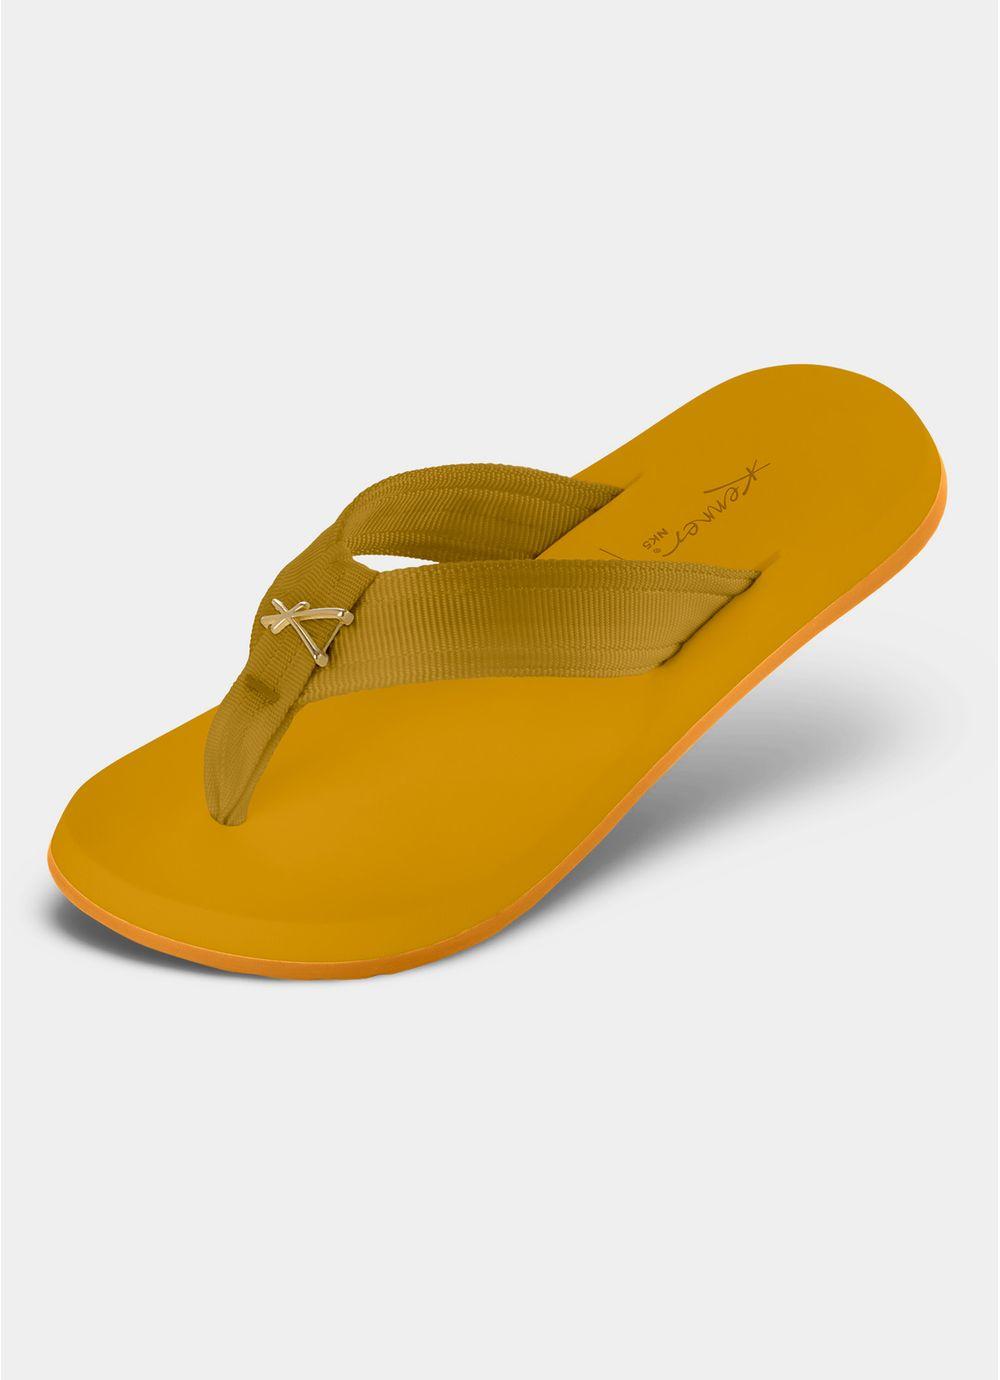 1246882389 SANDALIA KENNER CLASSIC NK5 GOLD AMARELO - Compre Online na Redley!